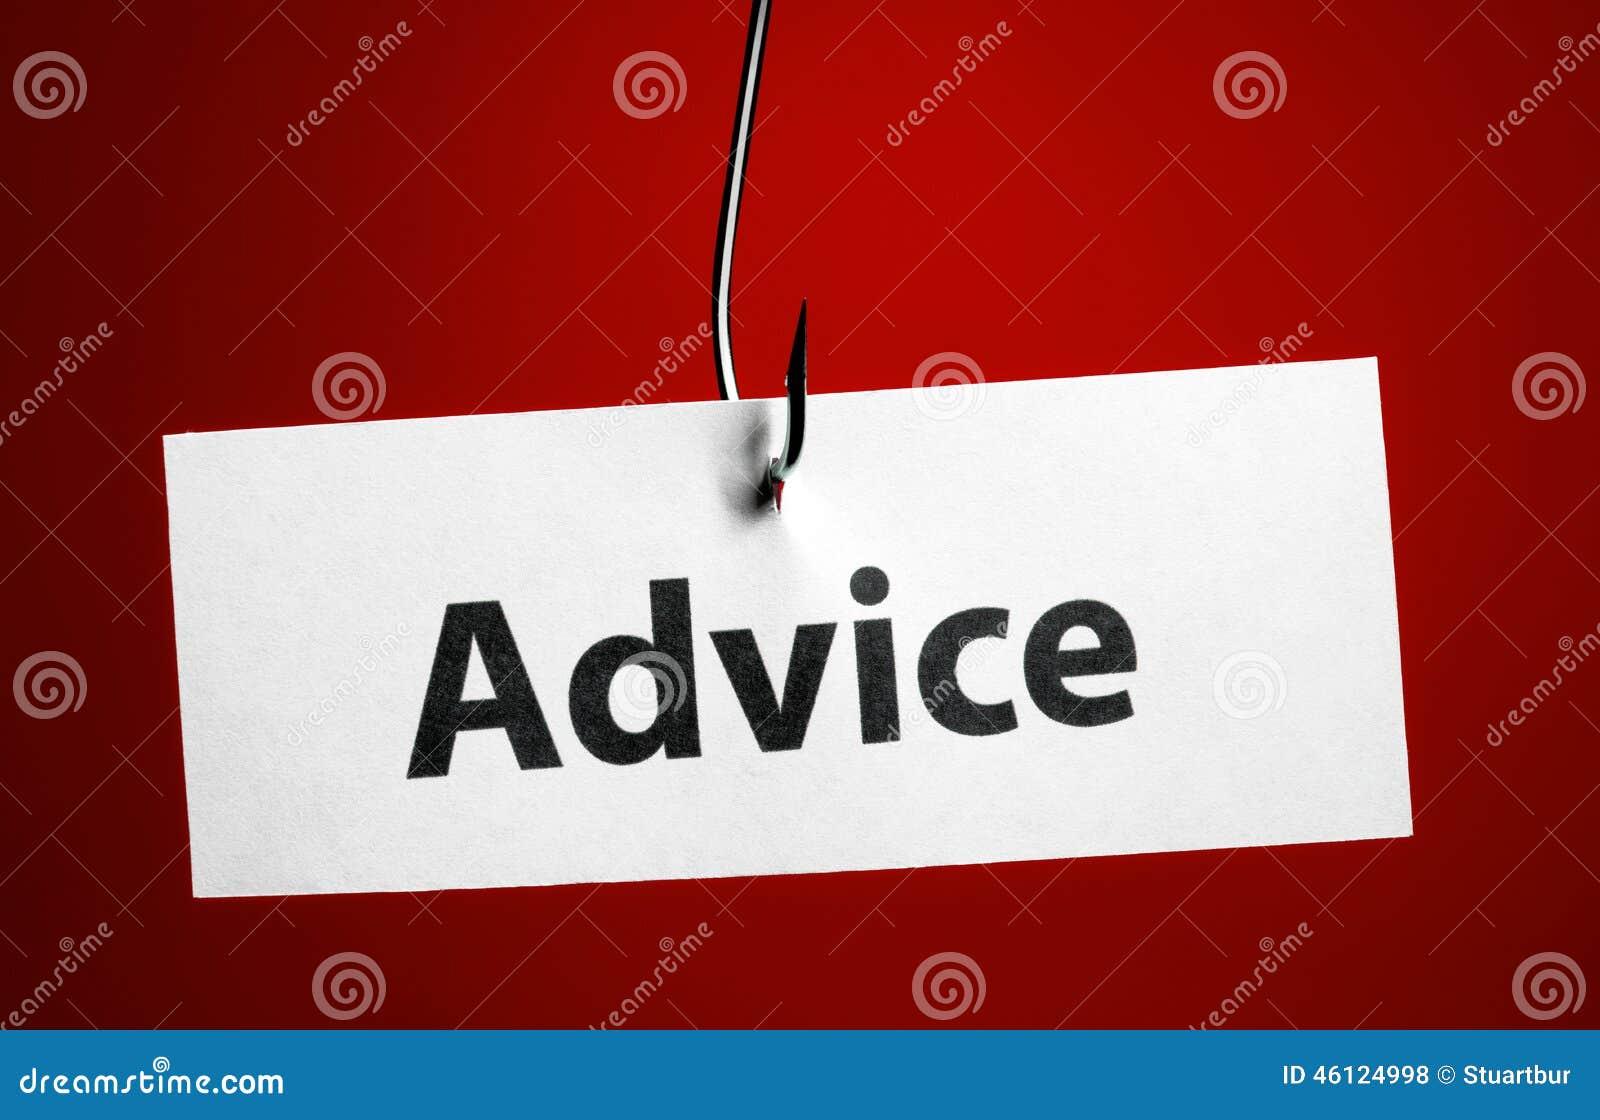 free hookup advice